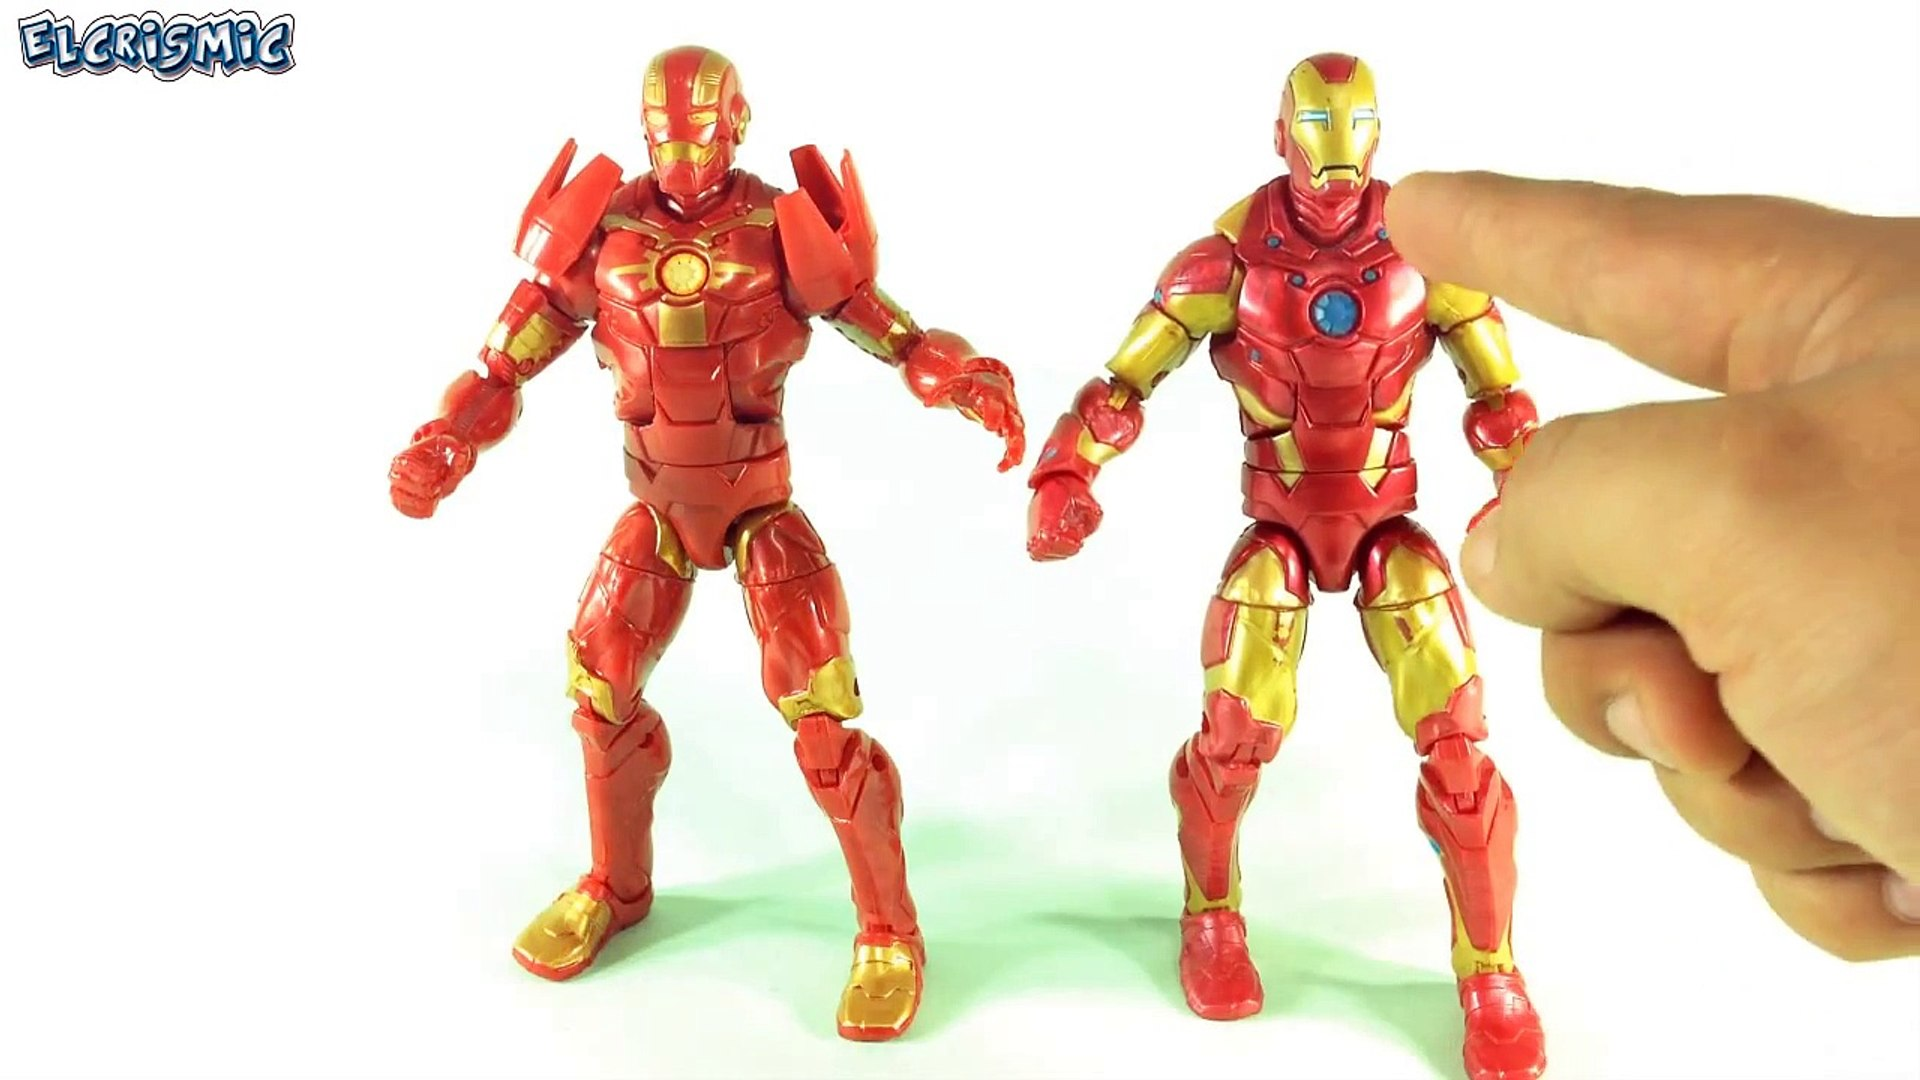 Iron Man Cosmic Marvel Legends Baf Groot Guardianes De La Galaxia ElCrisMic